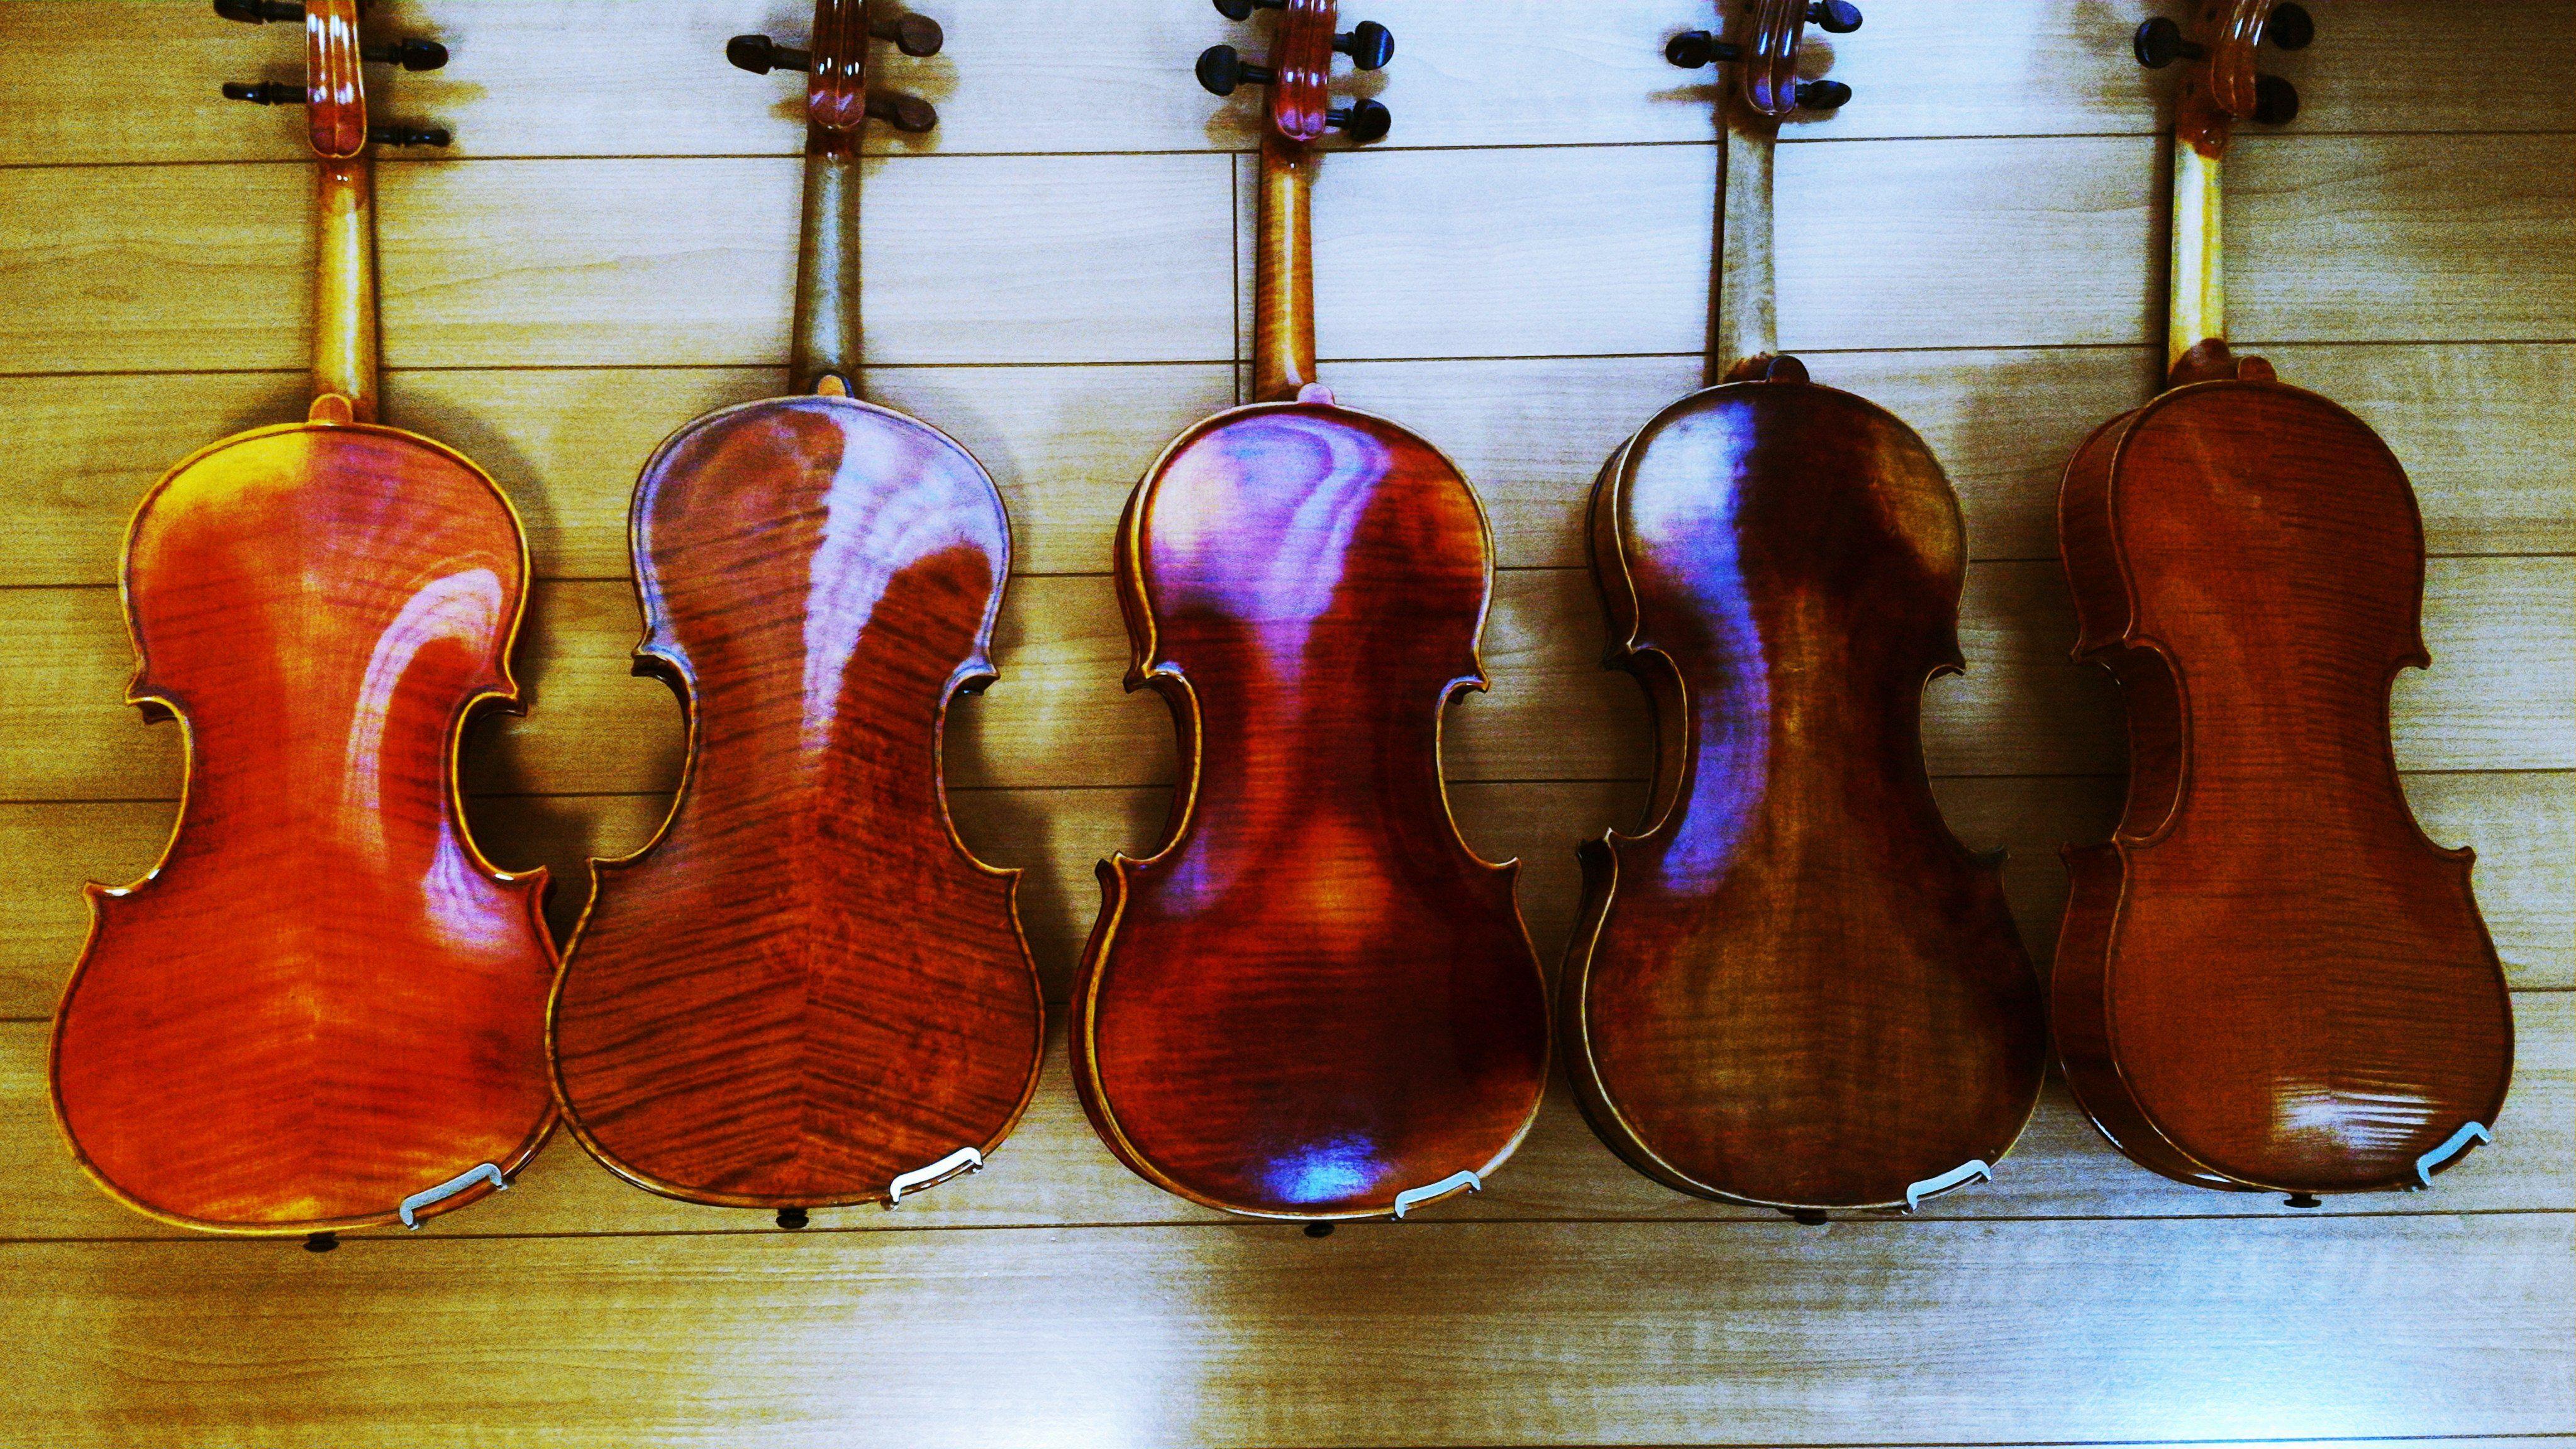 Violin S Back Shows Themself Beautiful バイオリンは背中で語る